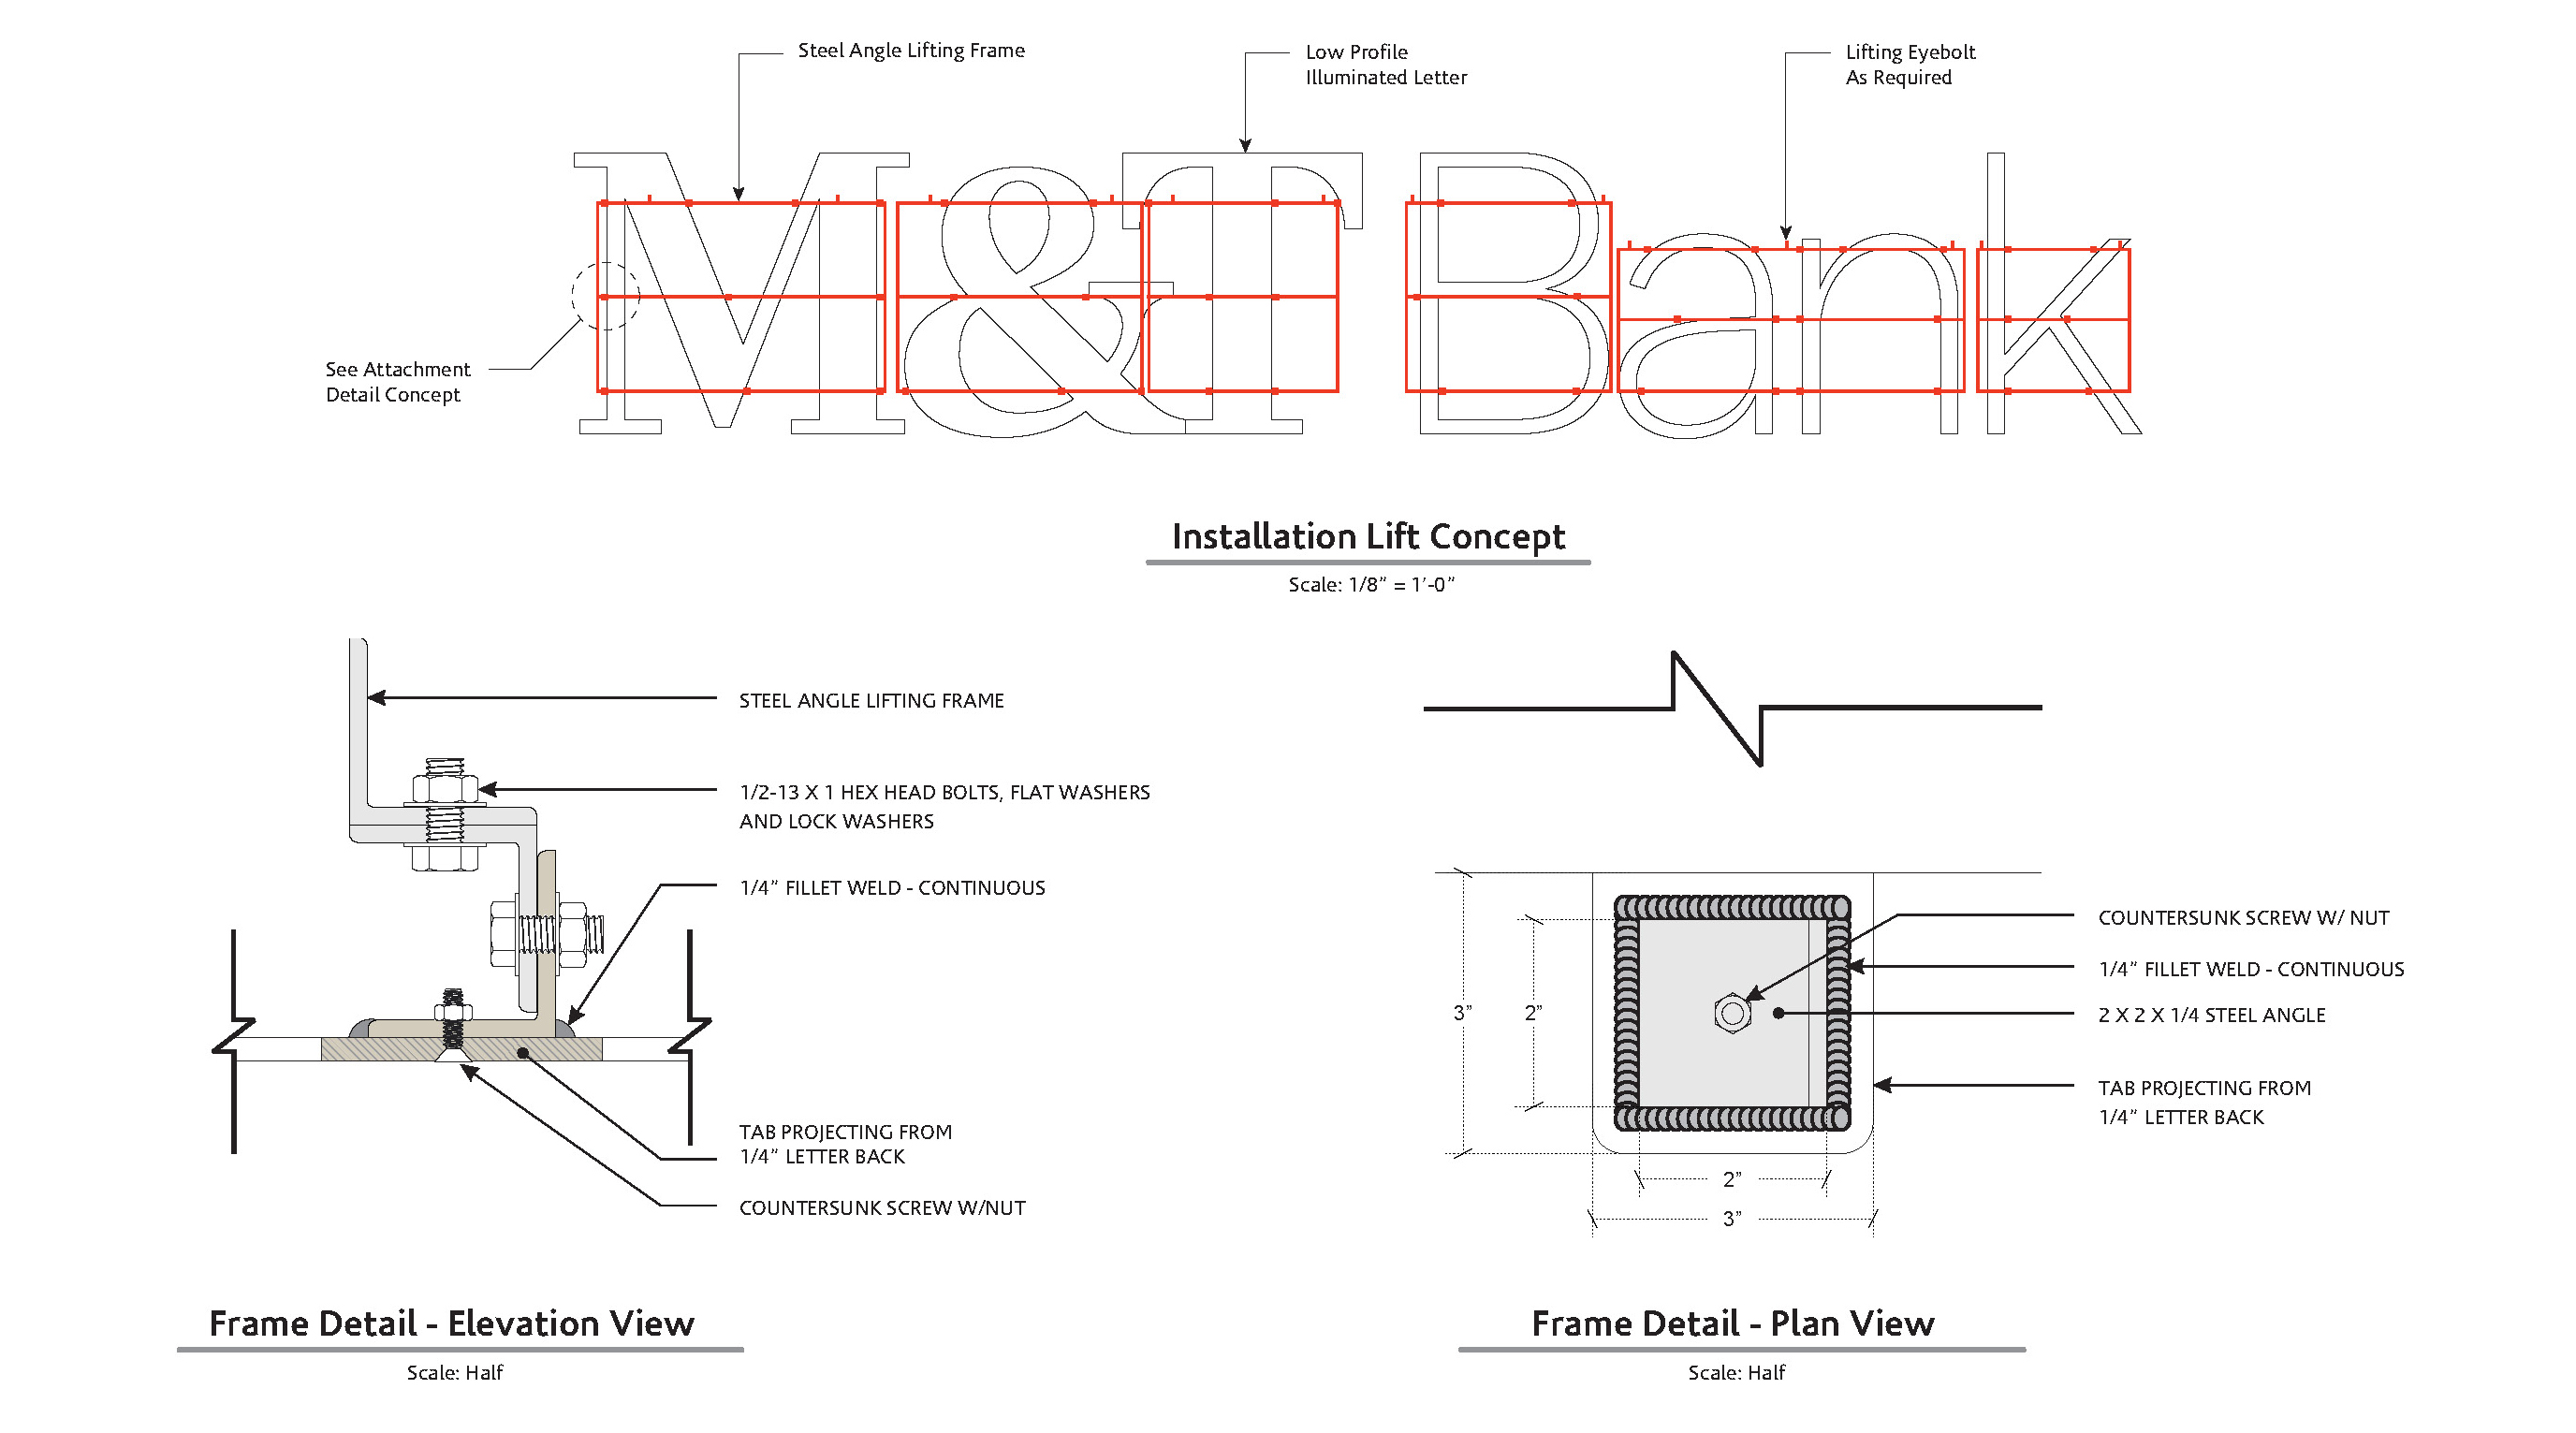 M&T Bank - Seneca One Tower - Design Drawing - 11